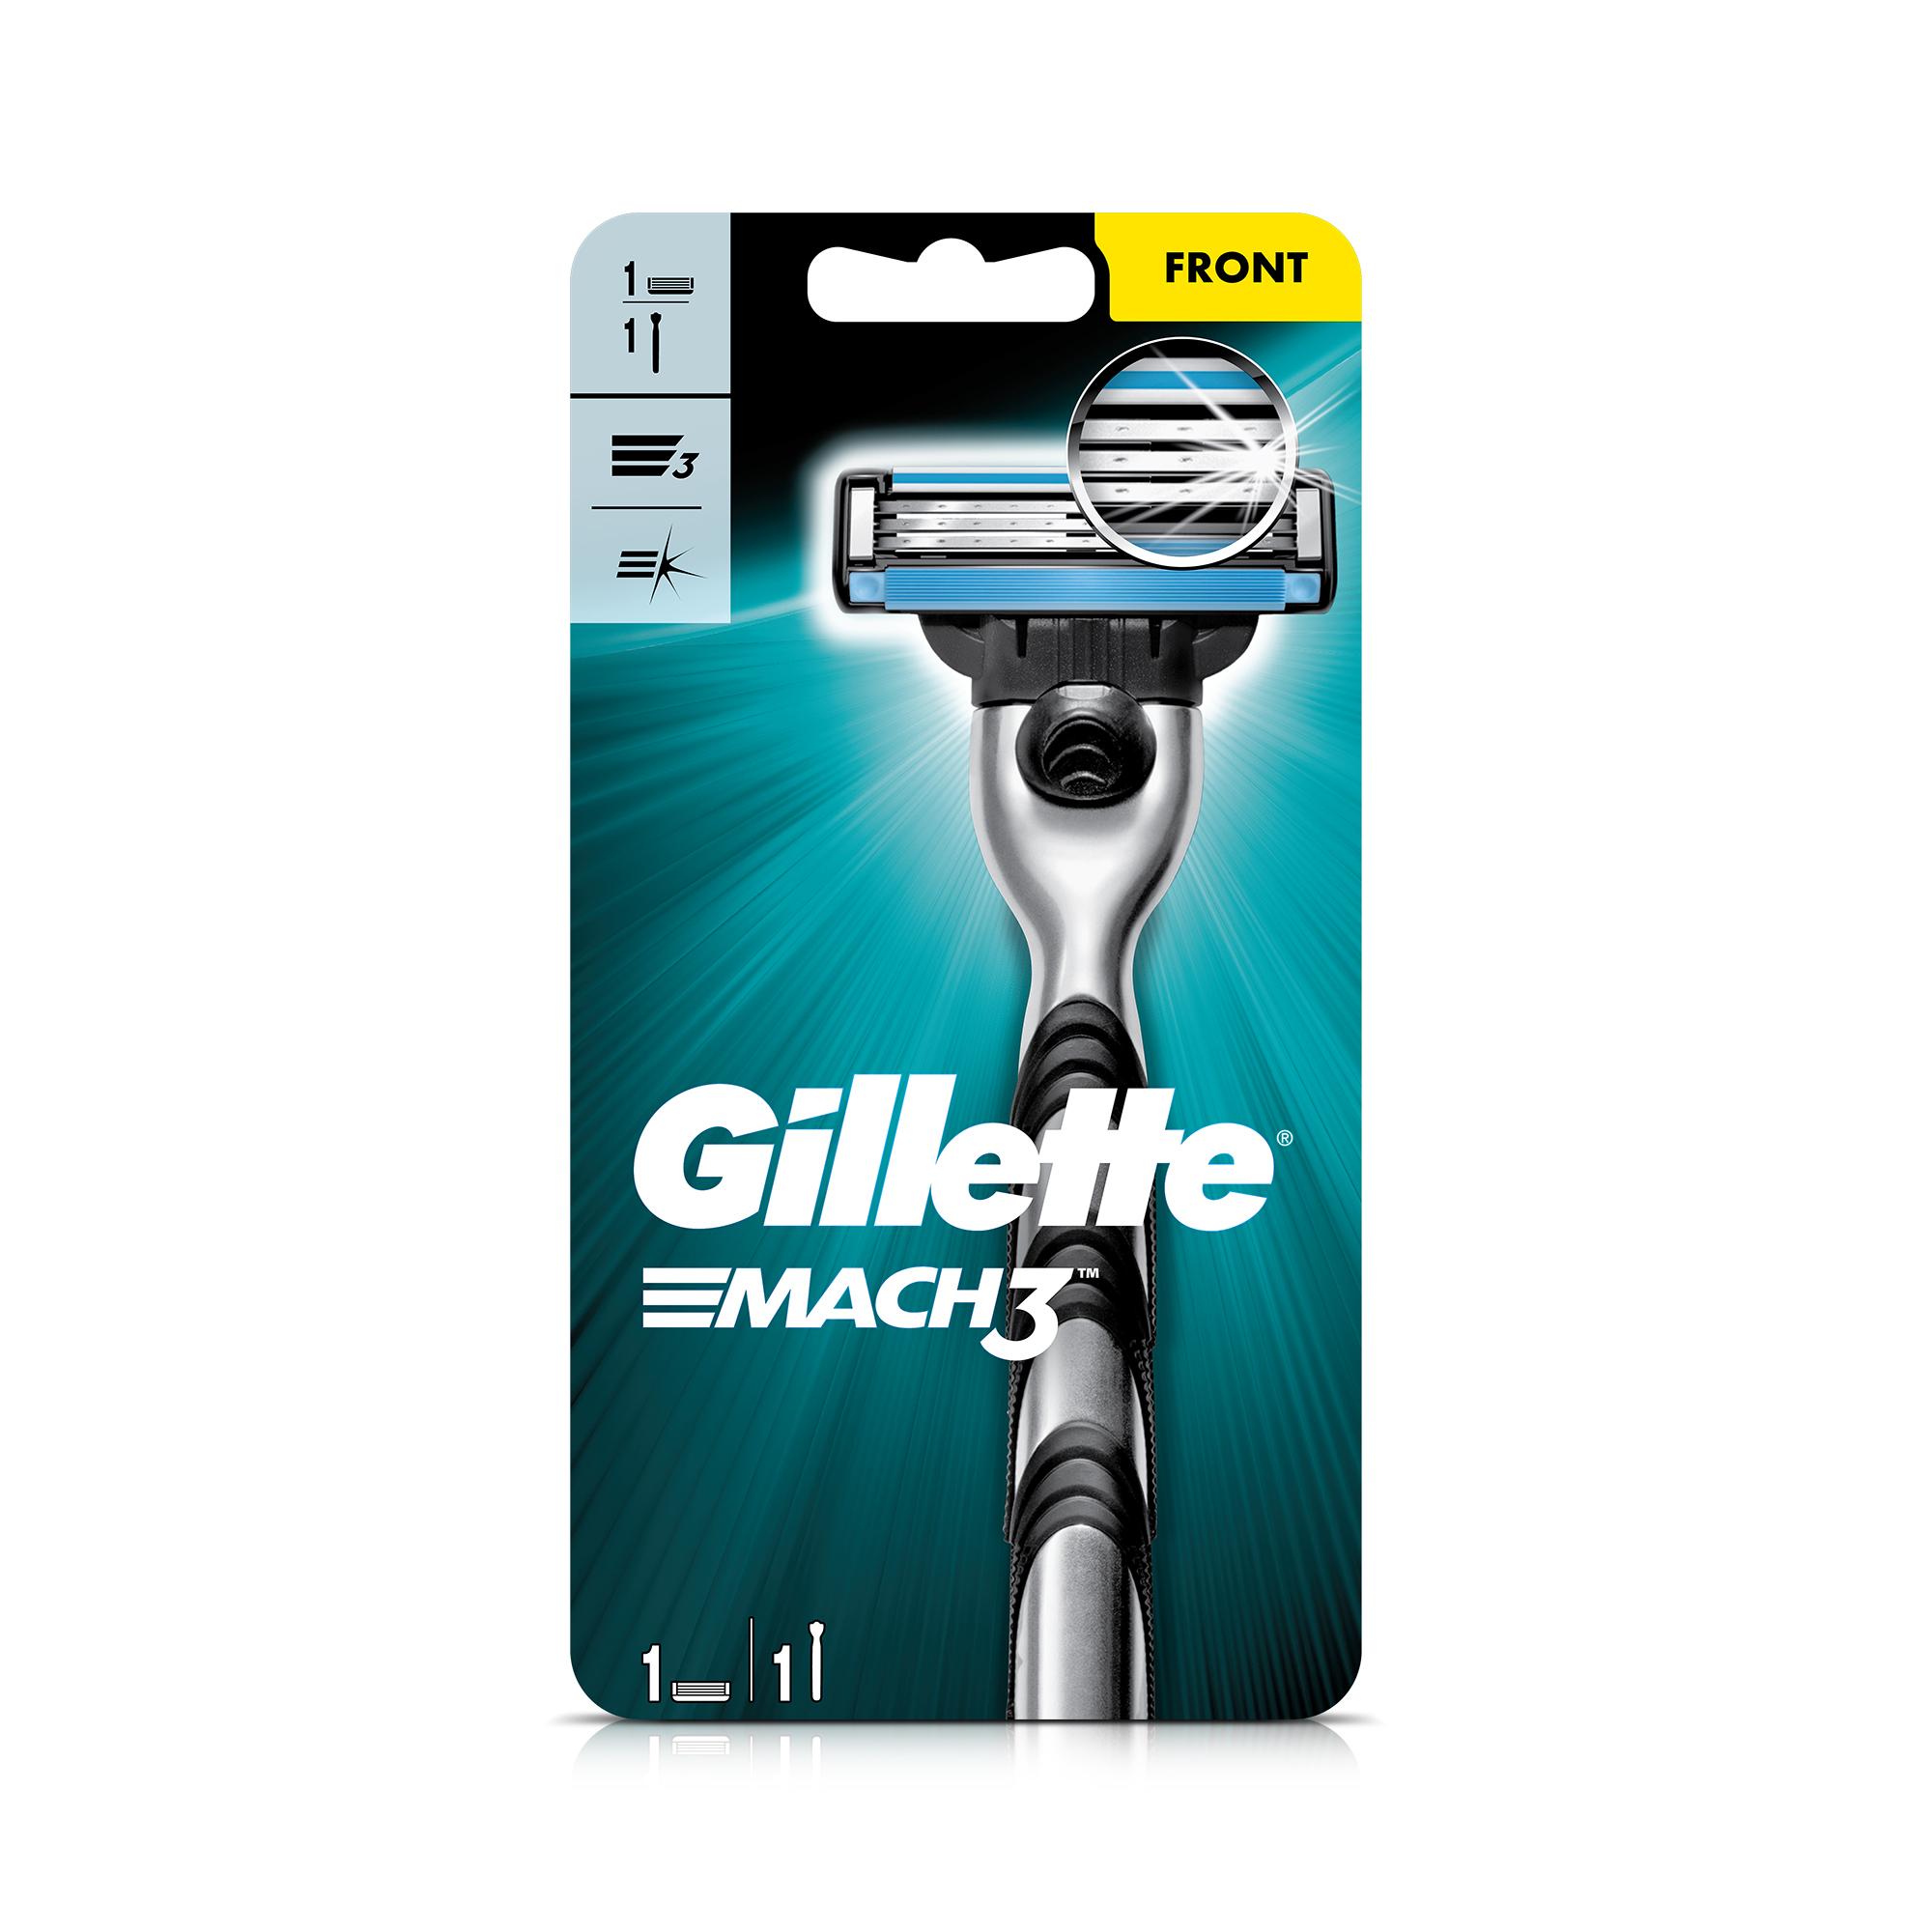 Gillette- Mach 3 Razor